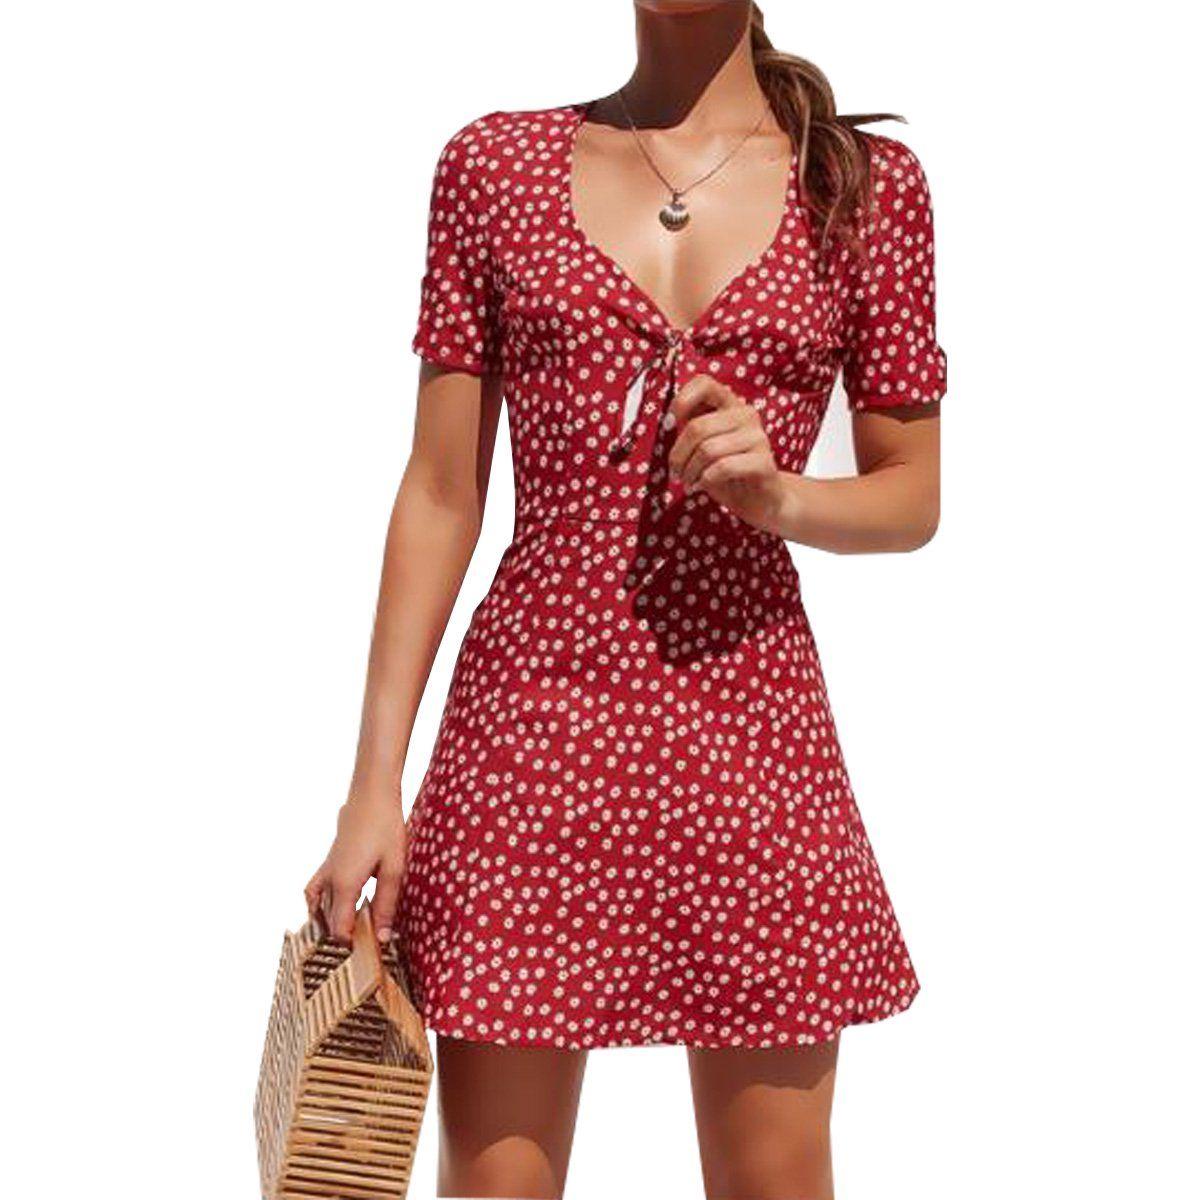 Misowmnjoy Womens Short Sleeve Boho Floral Wrap Dress Ladies Summer Holiday Party Sundress Walmart Com Walm In 2021 Mini Dress Womens Dresses Backless Mini Dress [ 1200 x 1200 Pixel ]